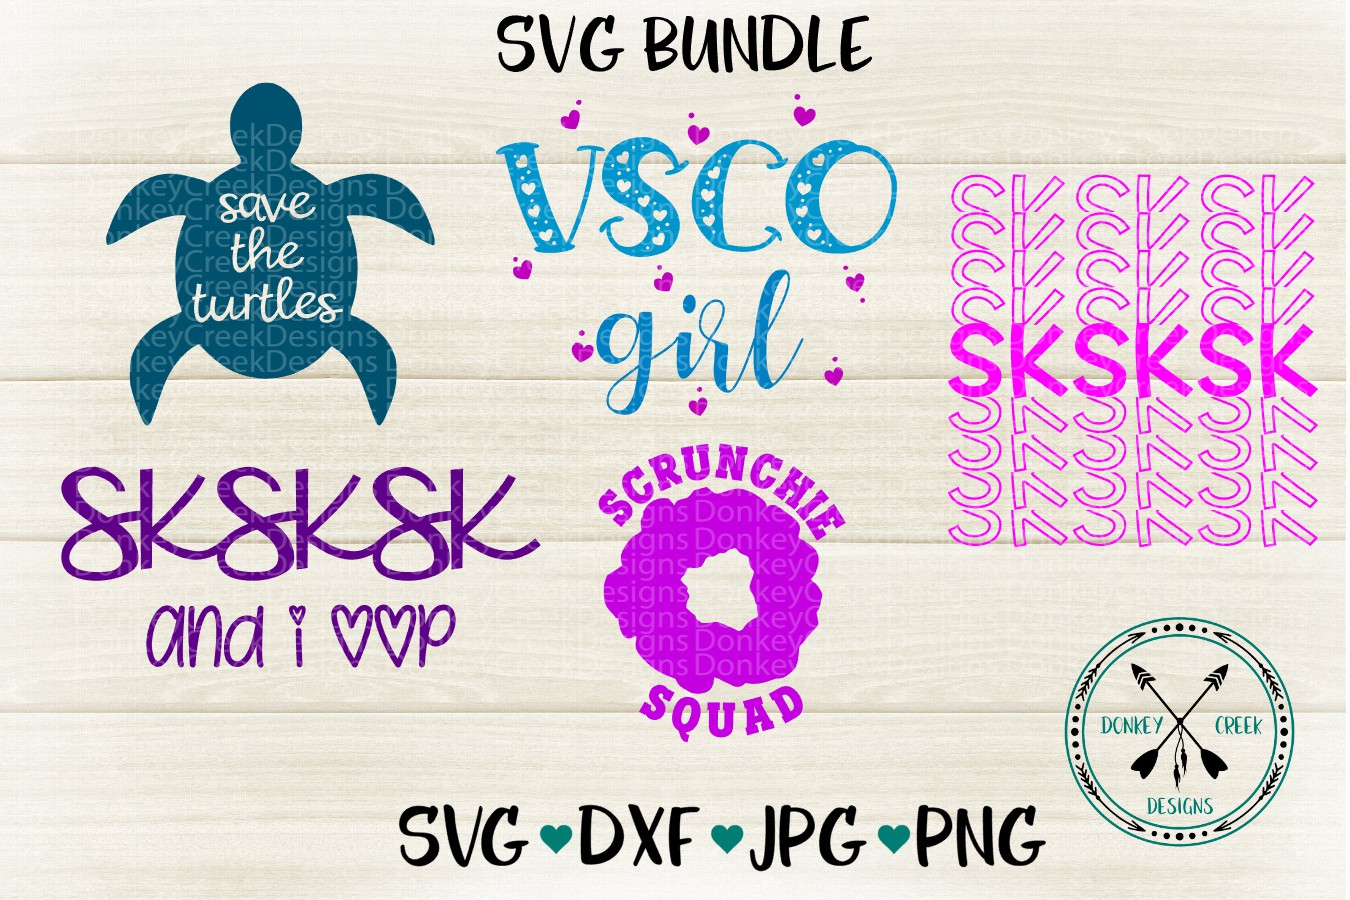 VSCO Girl SVG Bundle example image 1